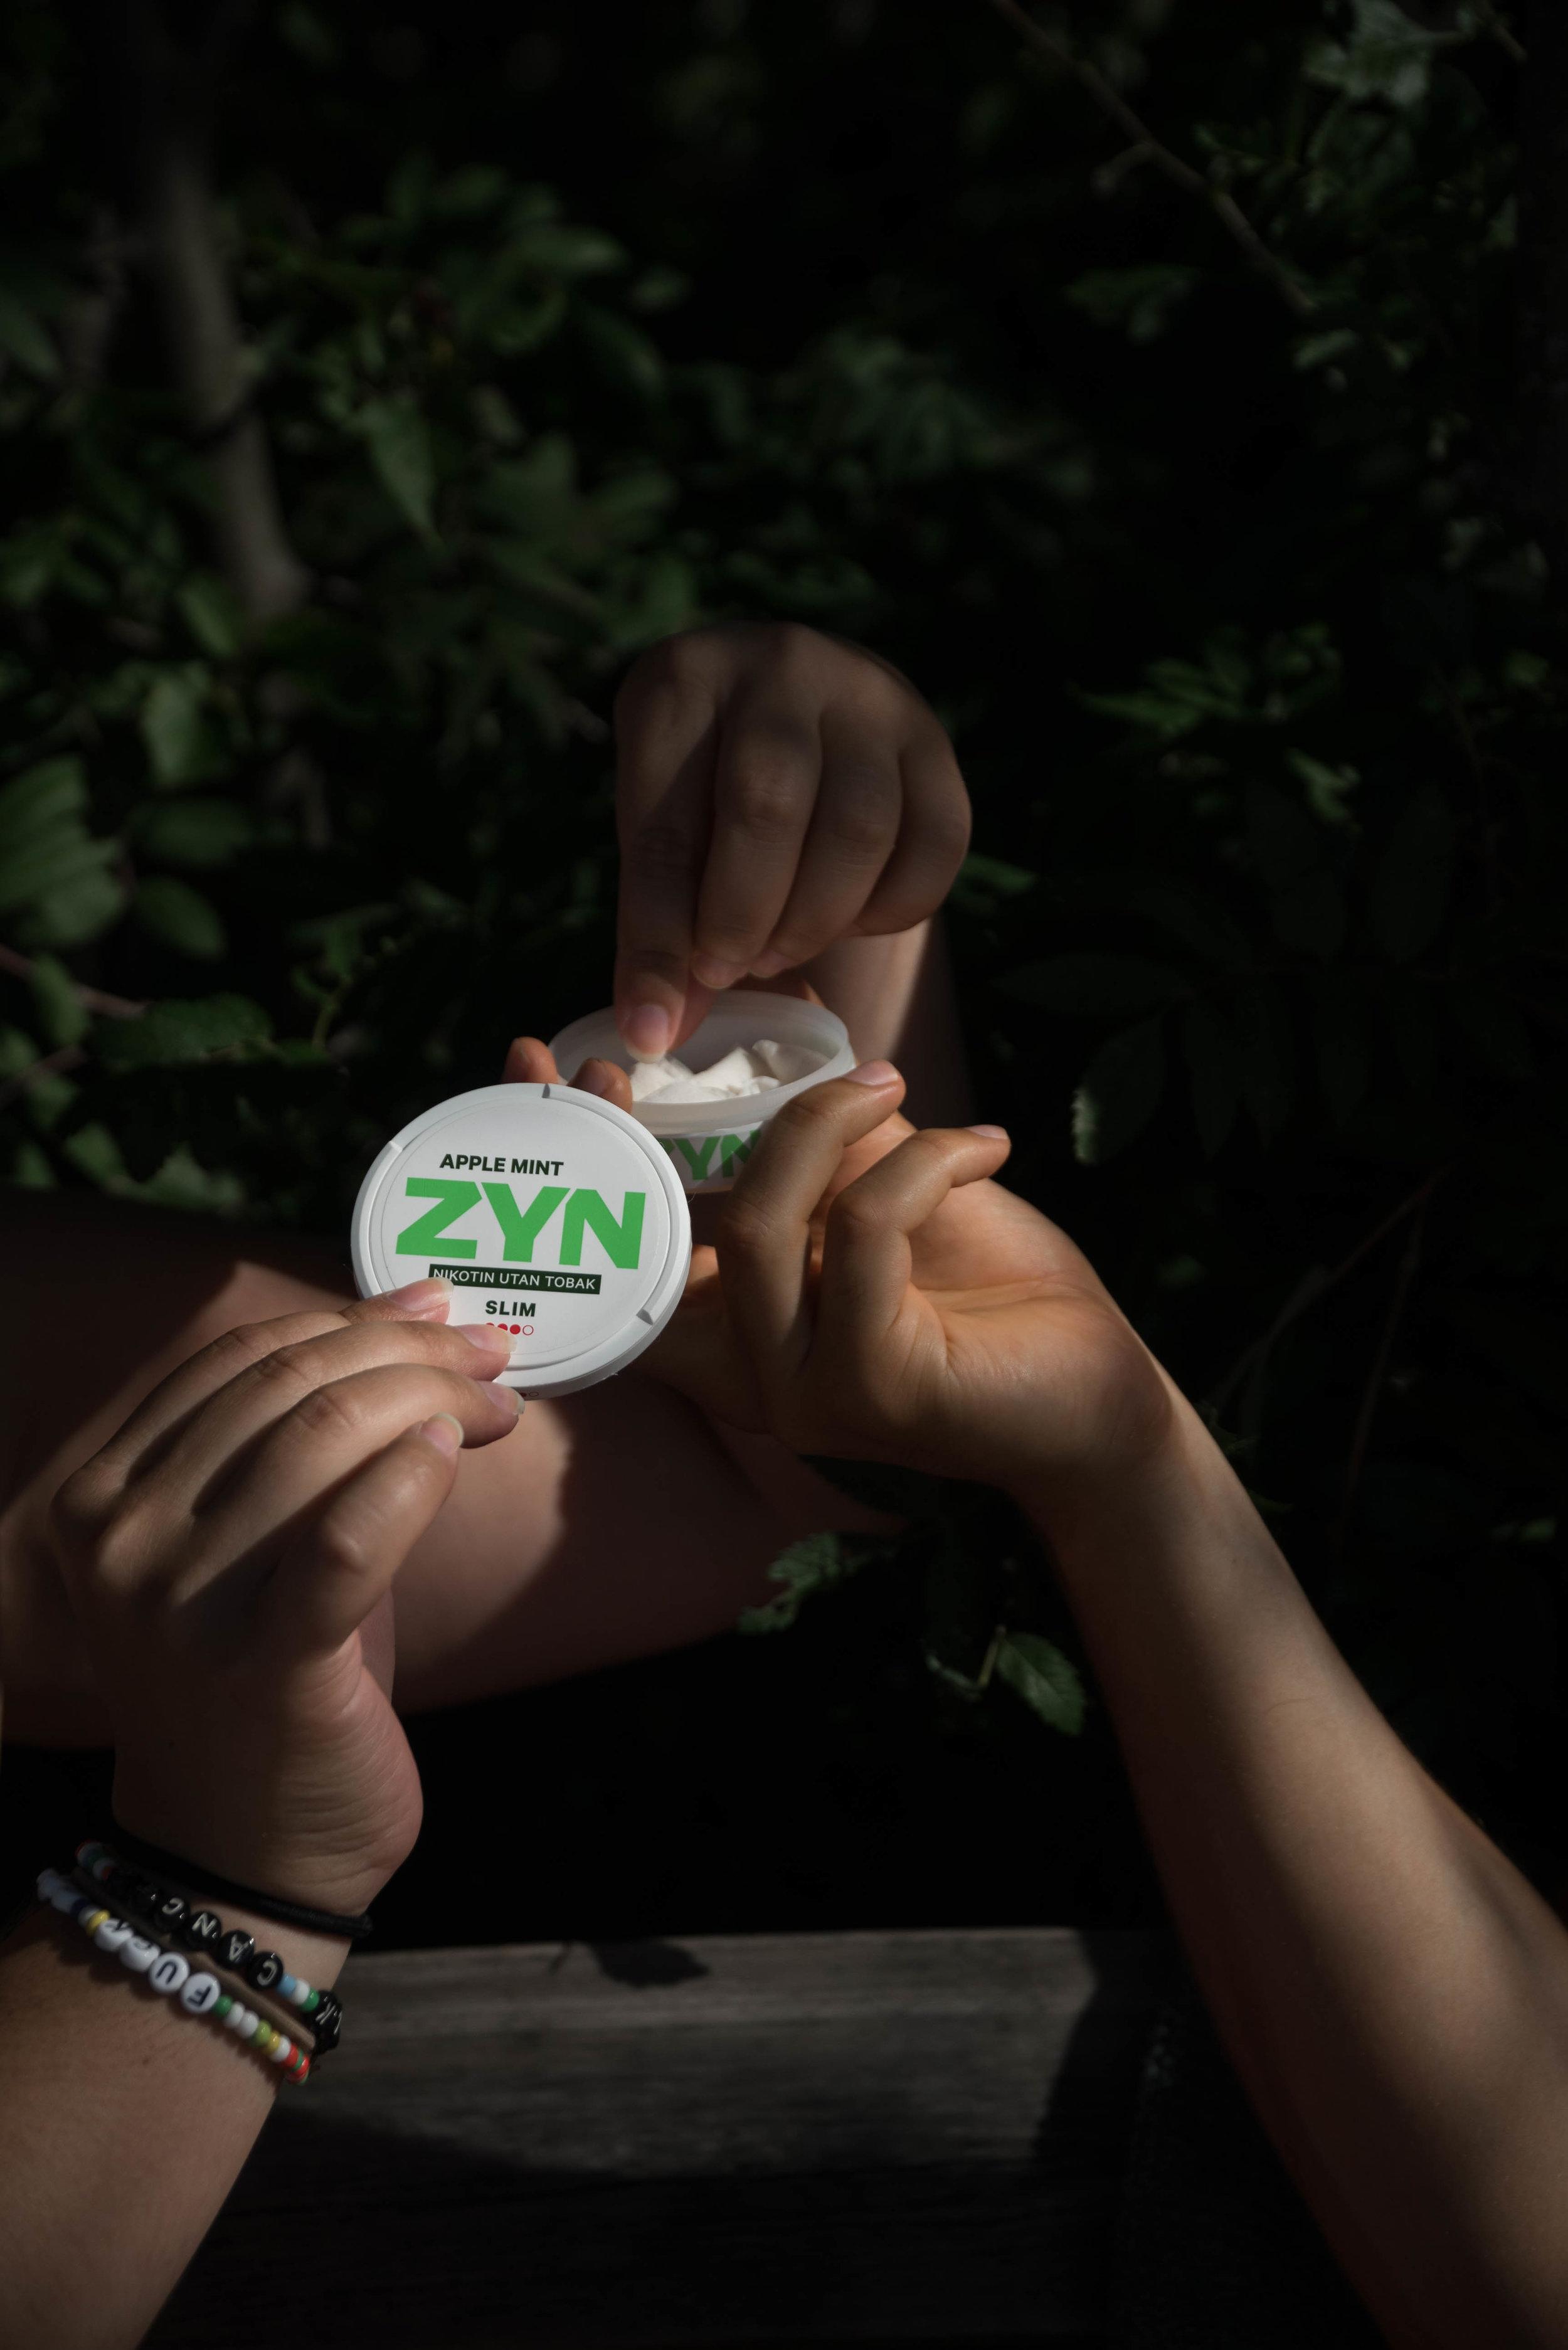 Snusbolaget/Zyn